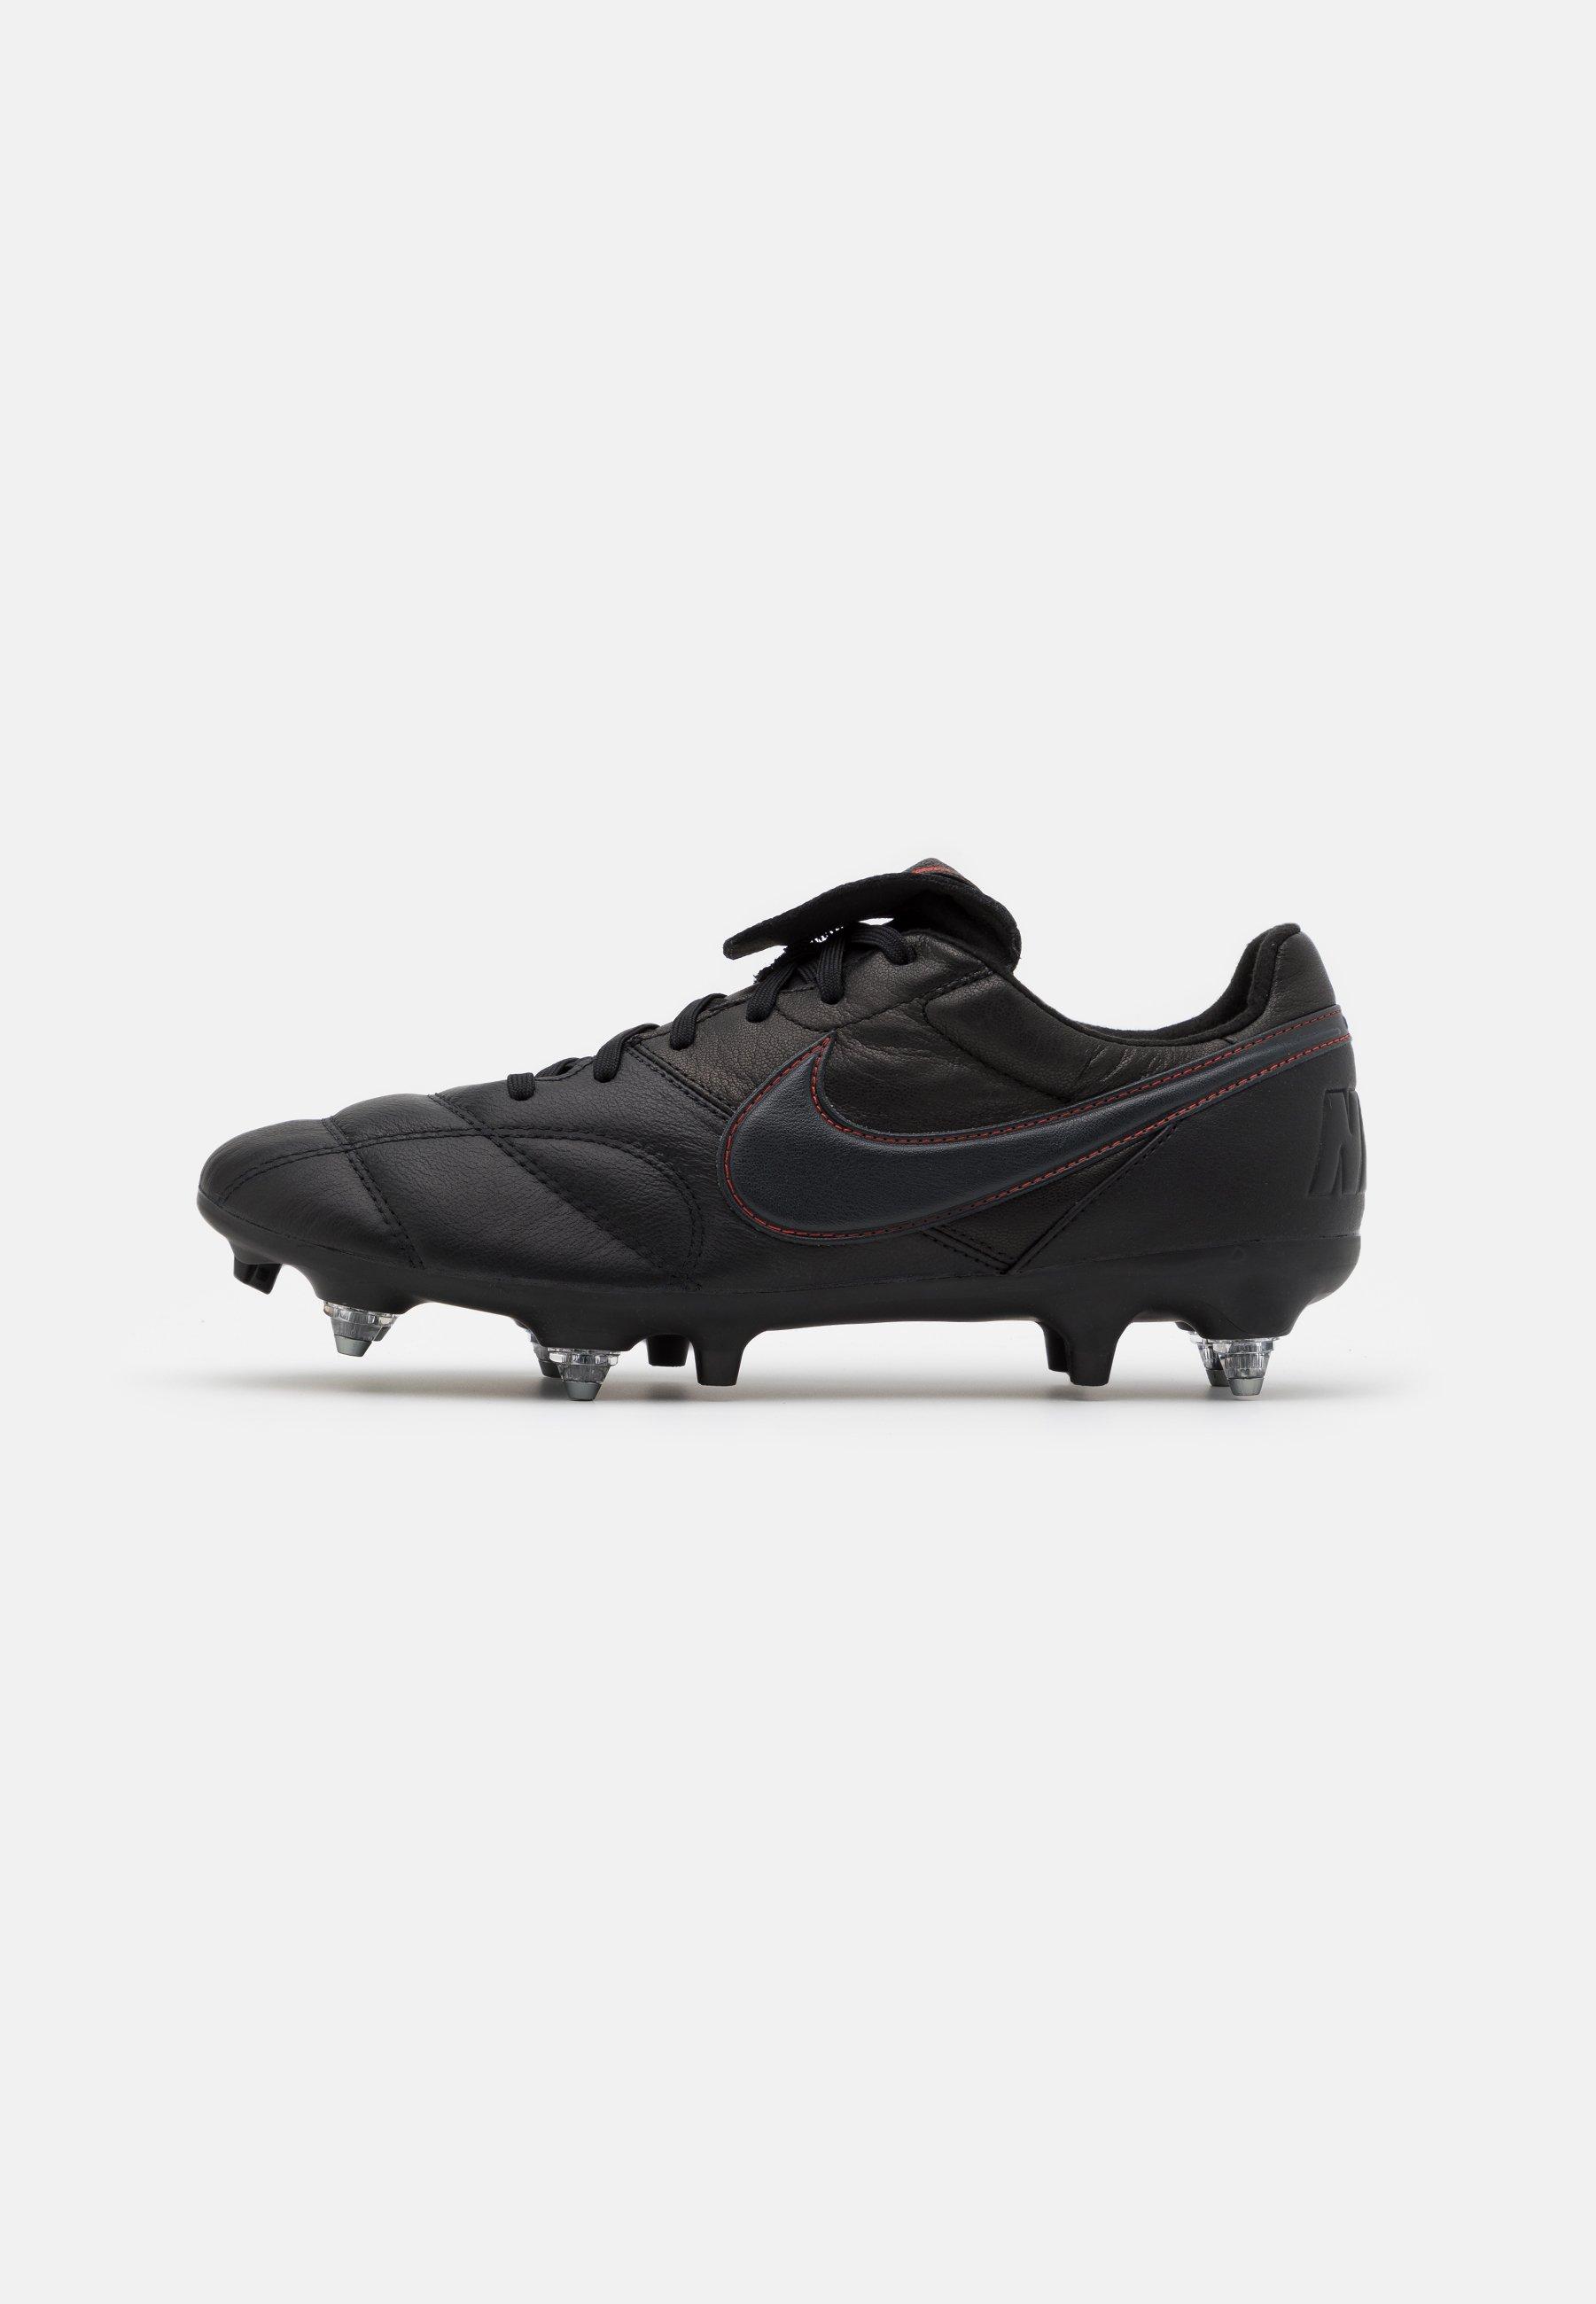 THE PREMIER II SG PRO AC Chaussures de foot à lamelles blackdark smoke greychile red